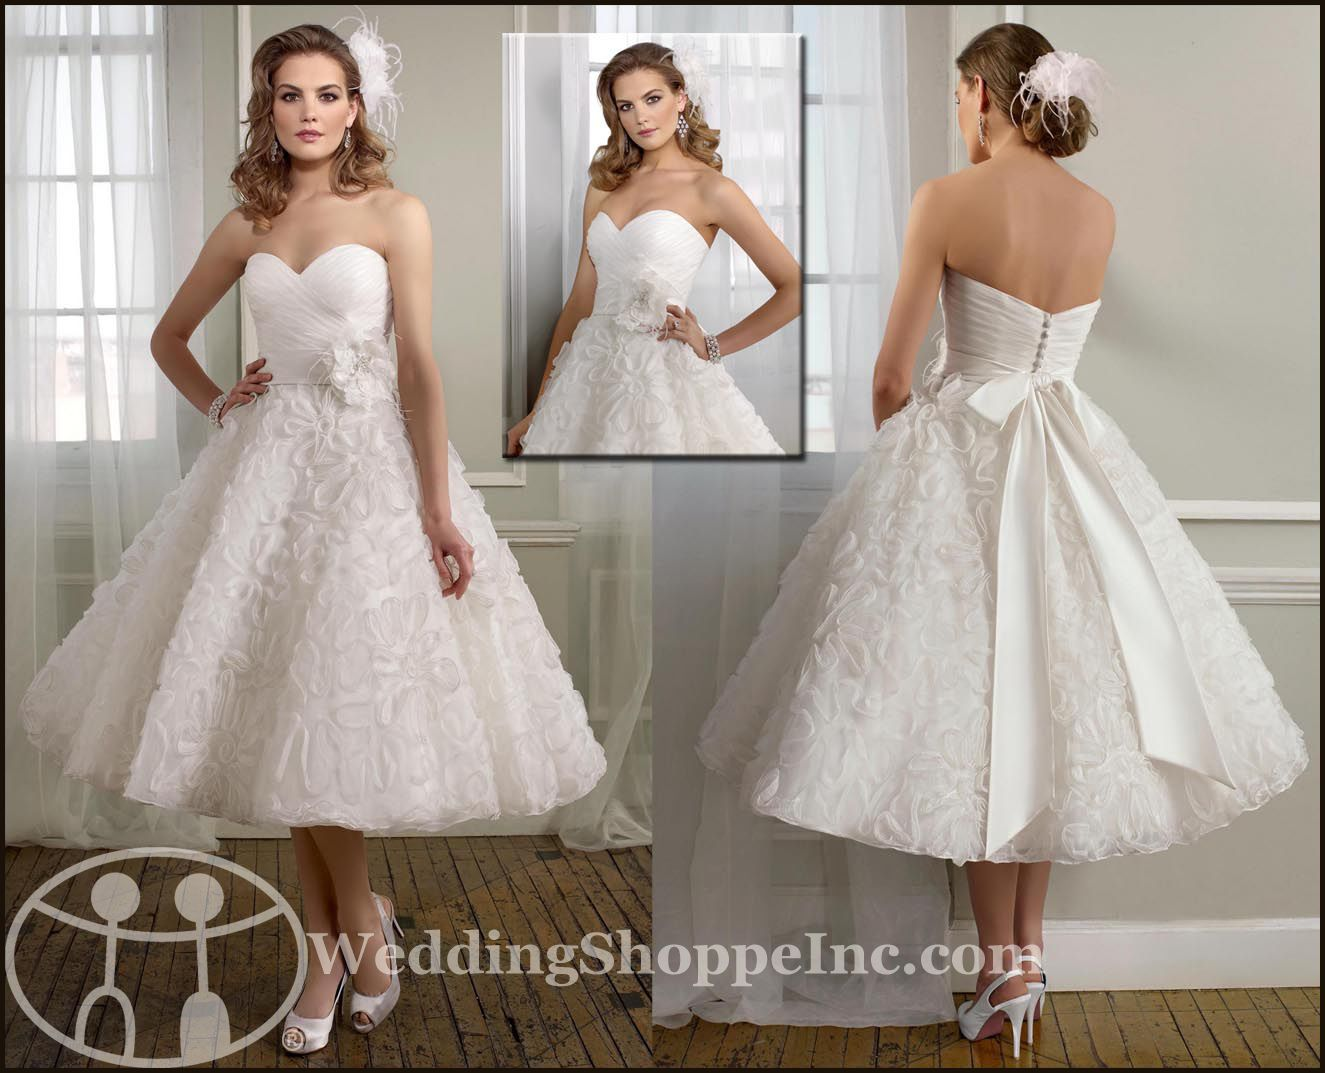 50 Vintage Looking Wedding Dresses Plus Size Dresses For Wedding